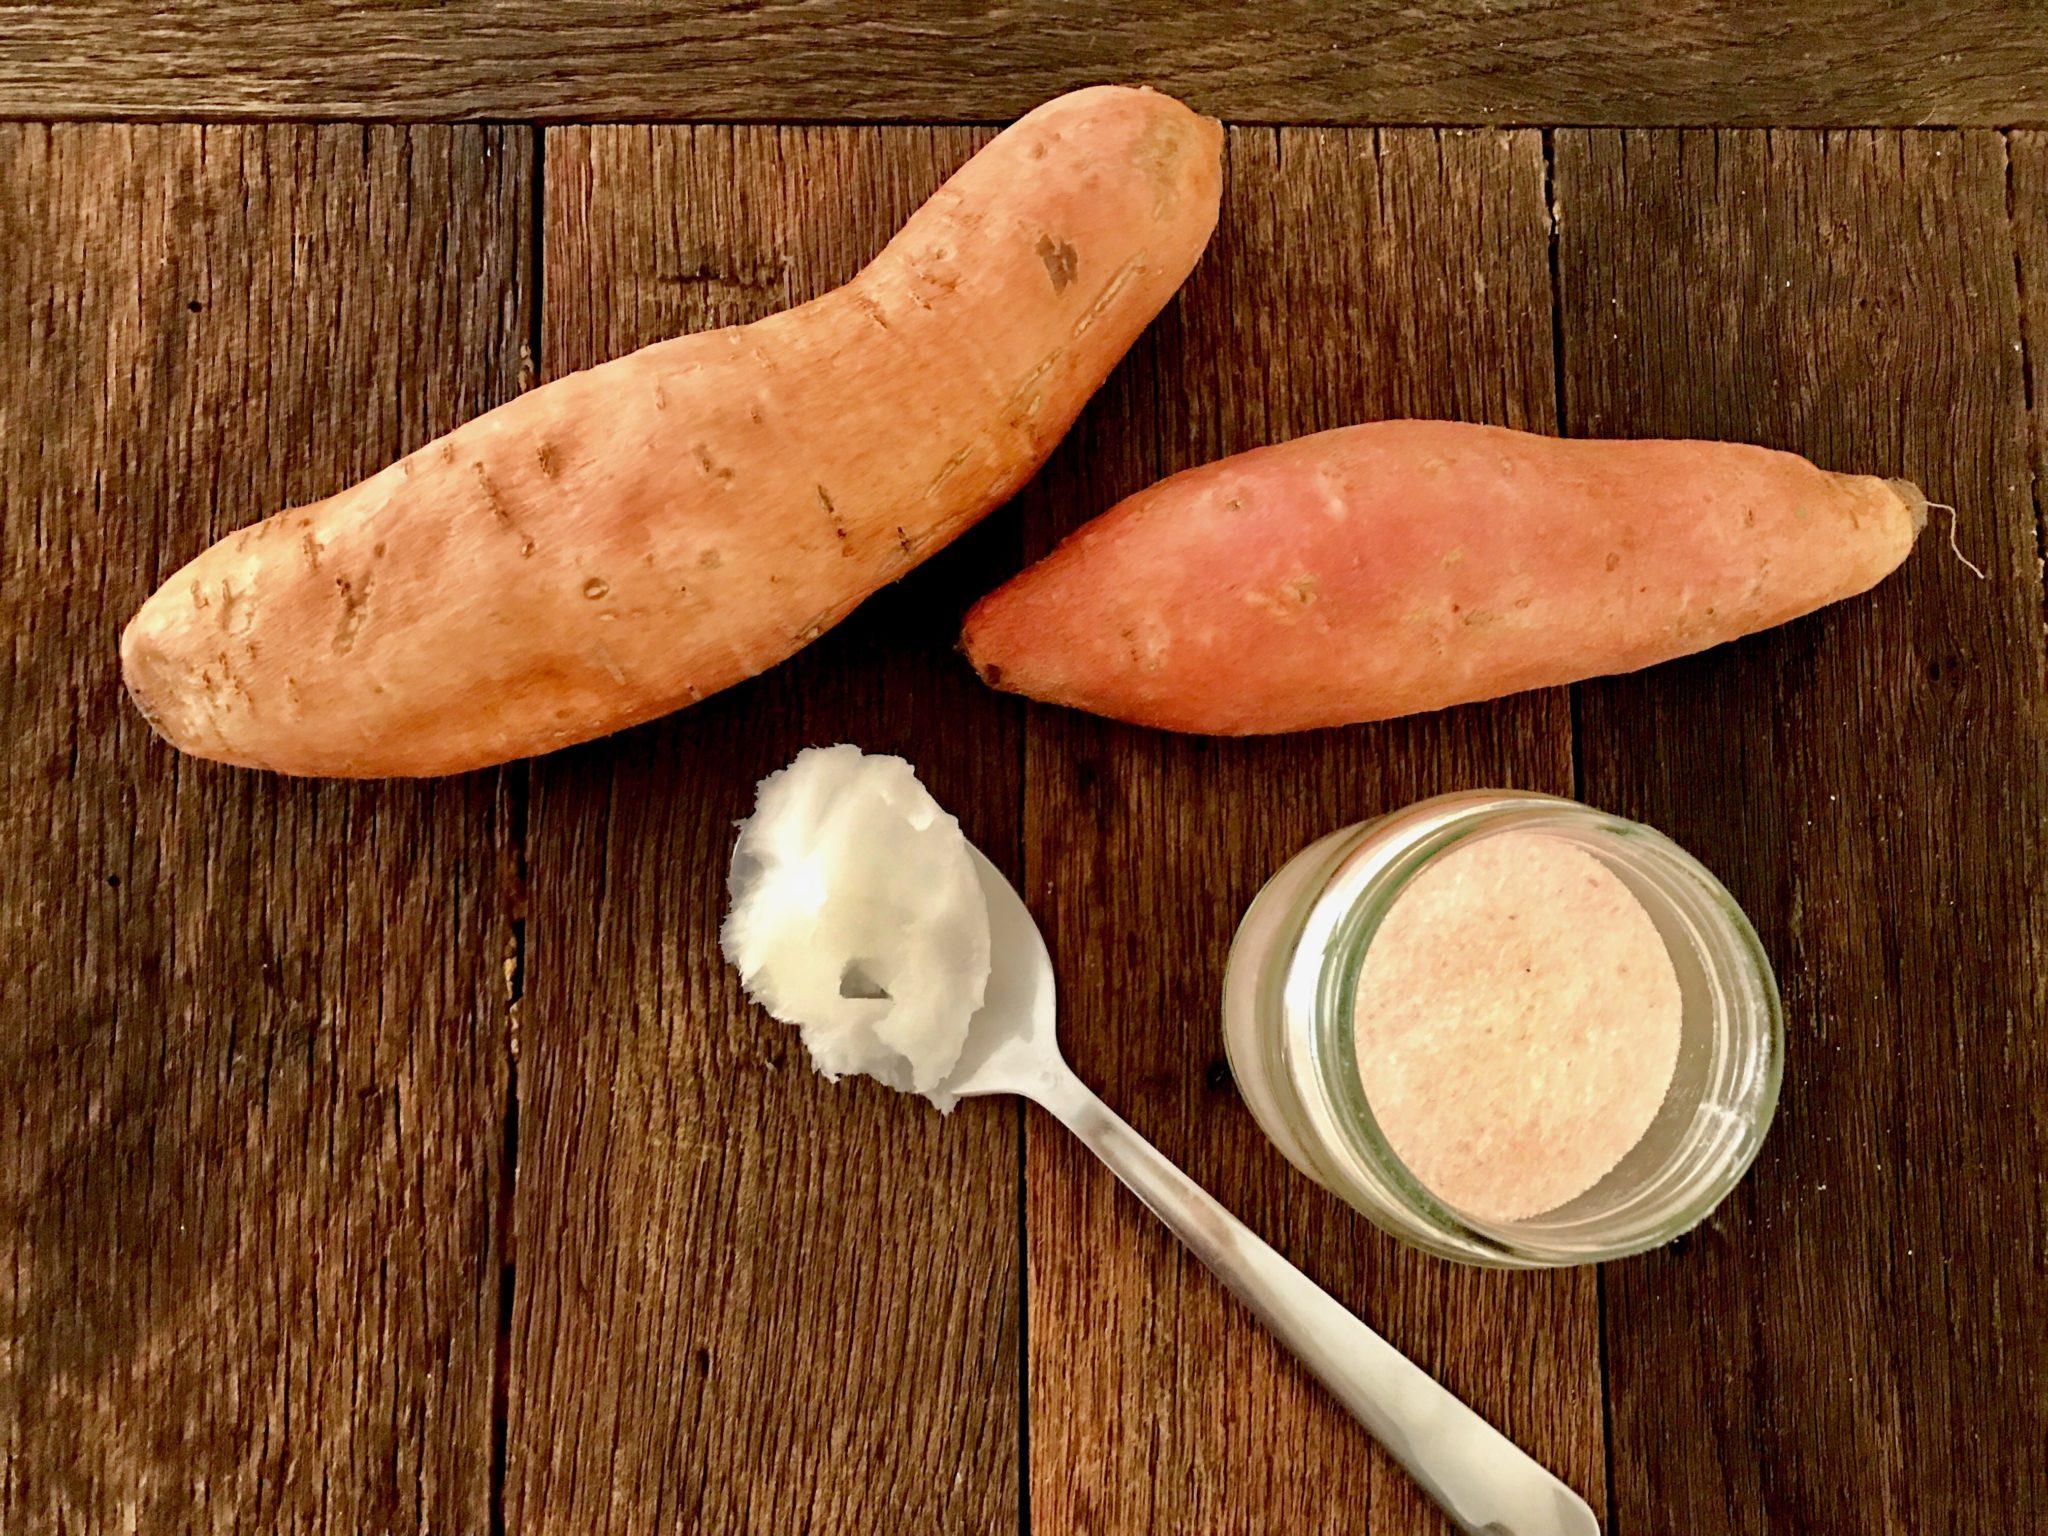 things to make roasted sweet potatoes